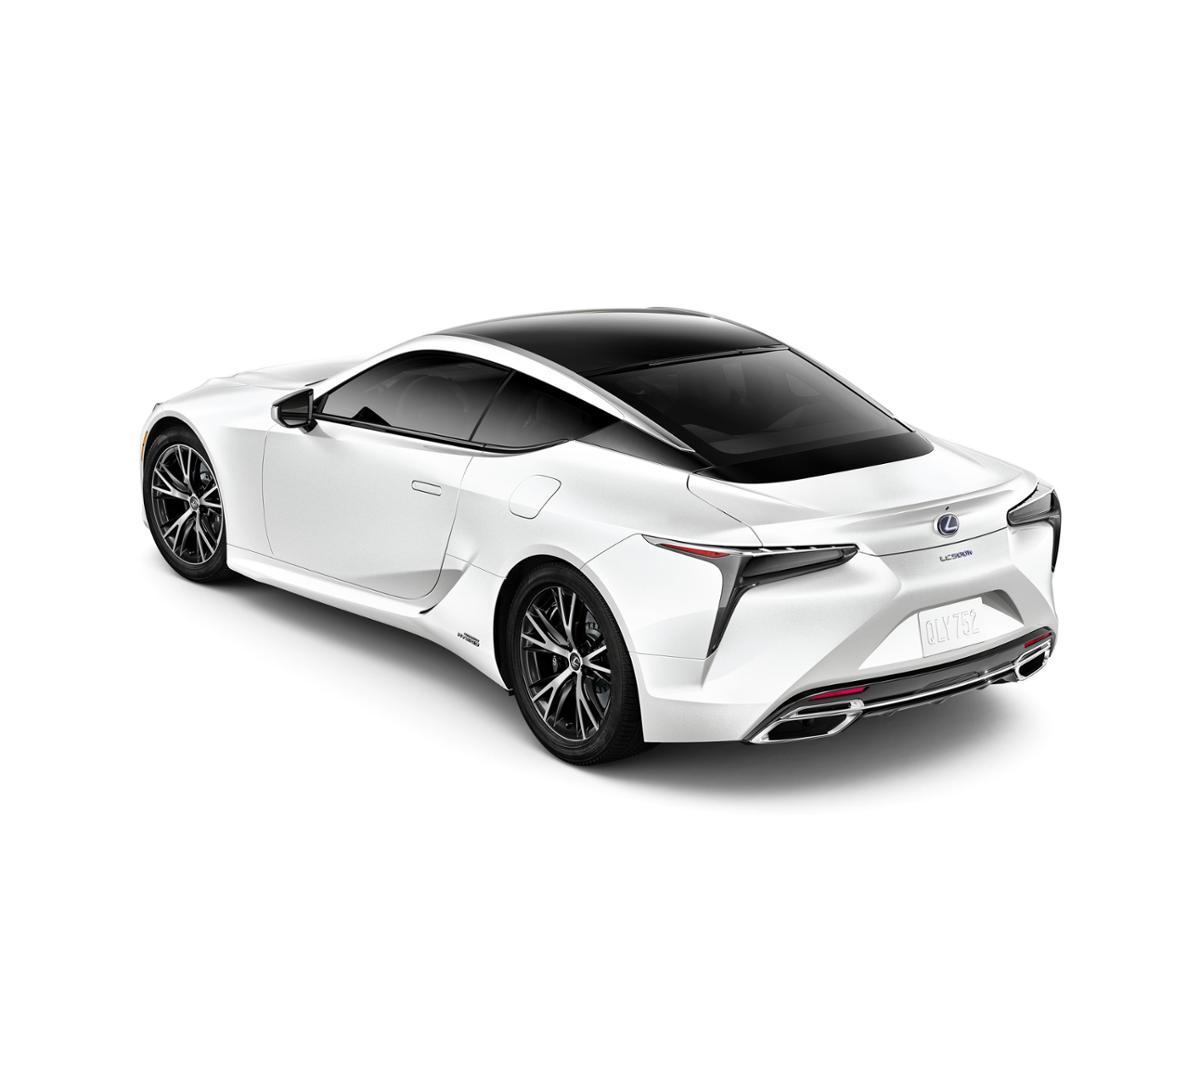 New Ultra White 2018 Lexus Lc 500h For Sale Santa Monica